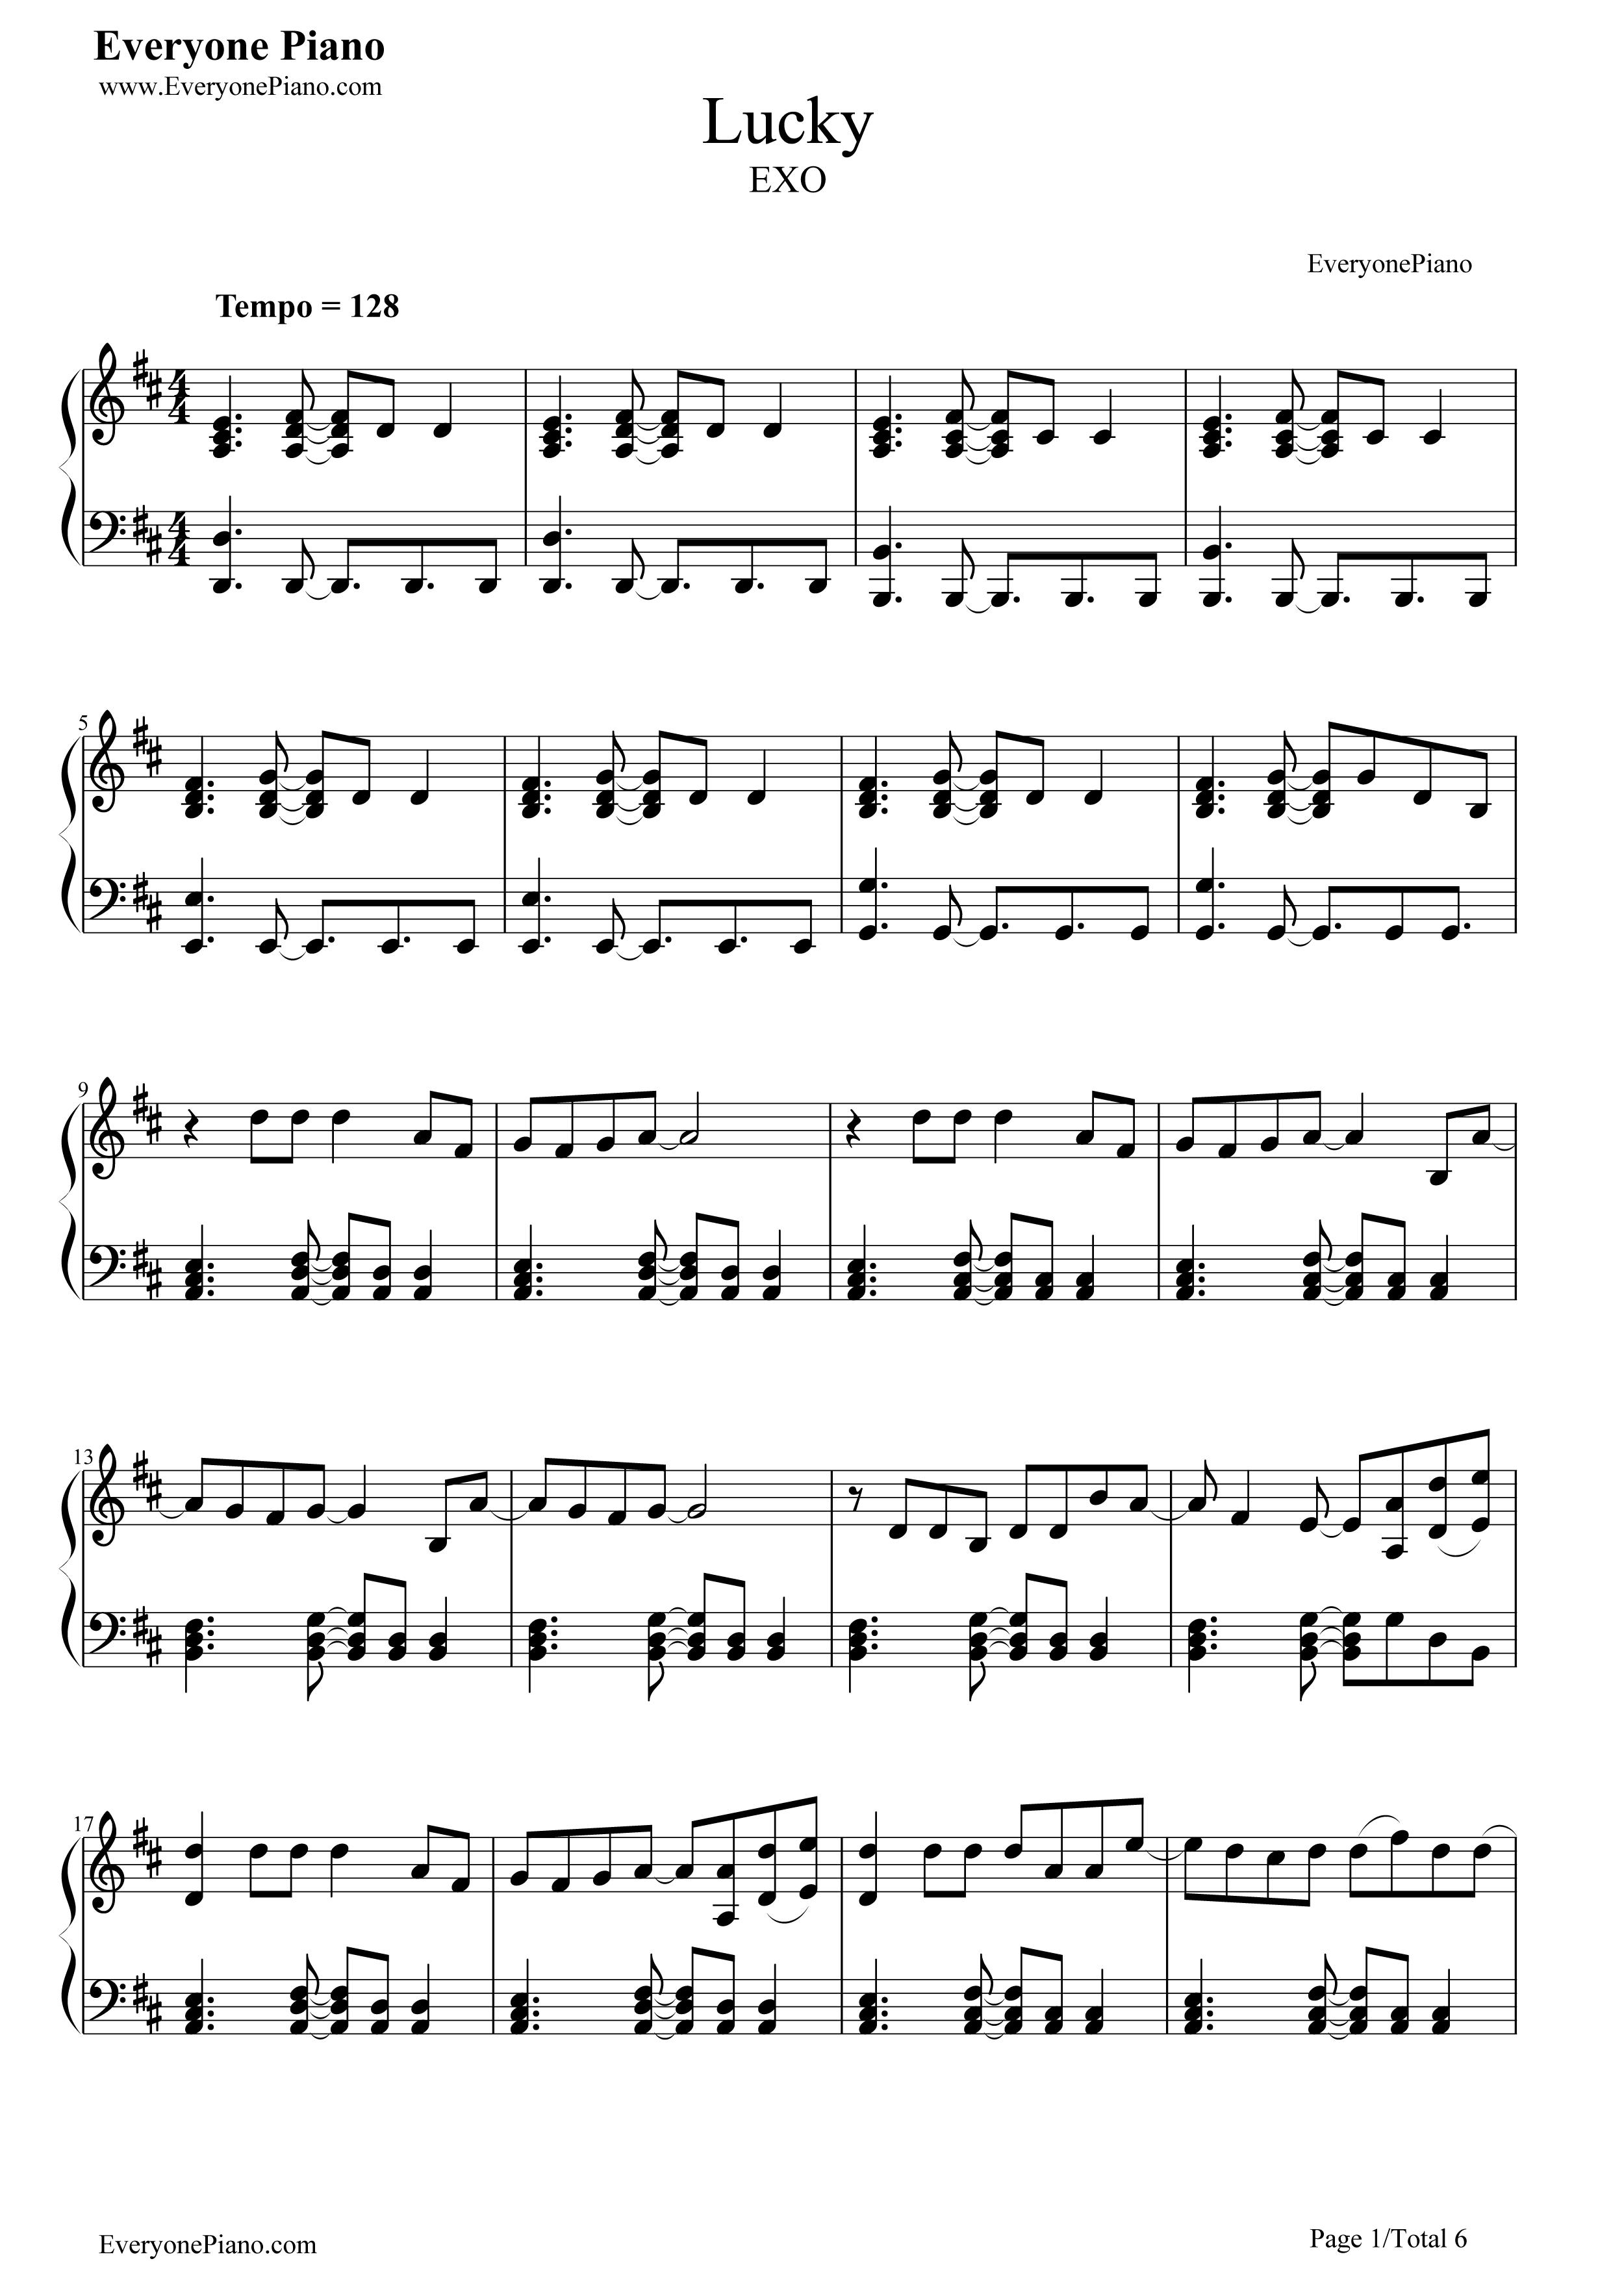 lucky-exo五线谱预览1-钢琴谱